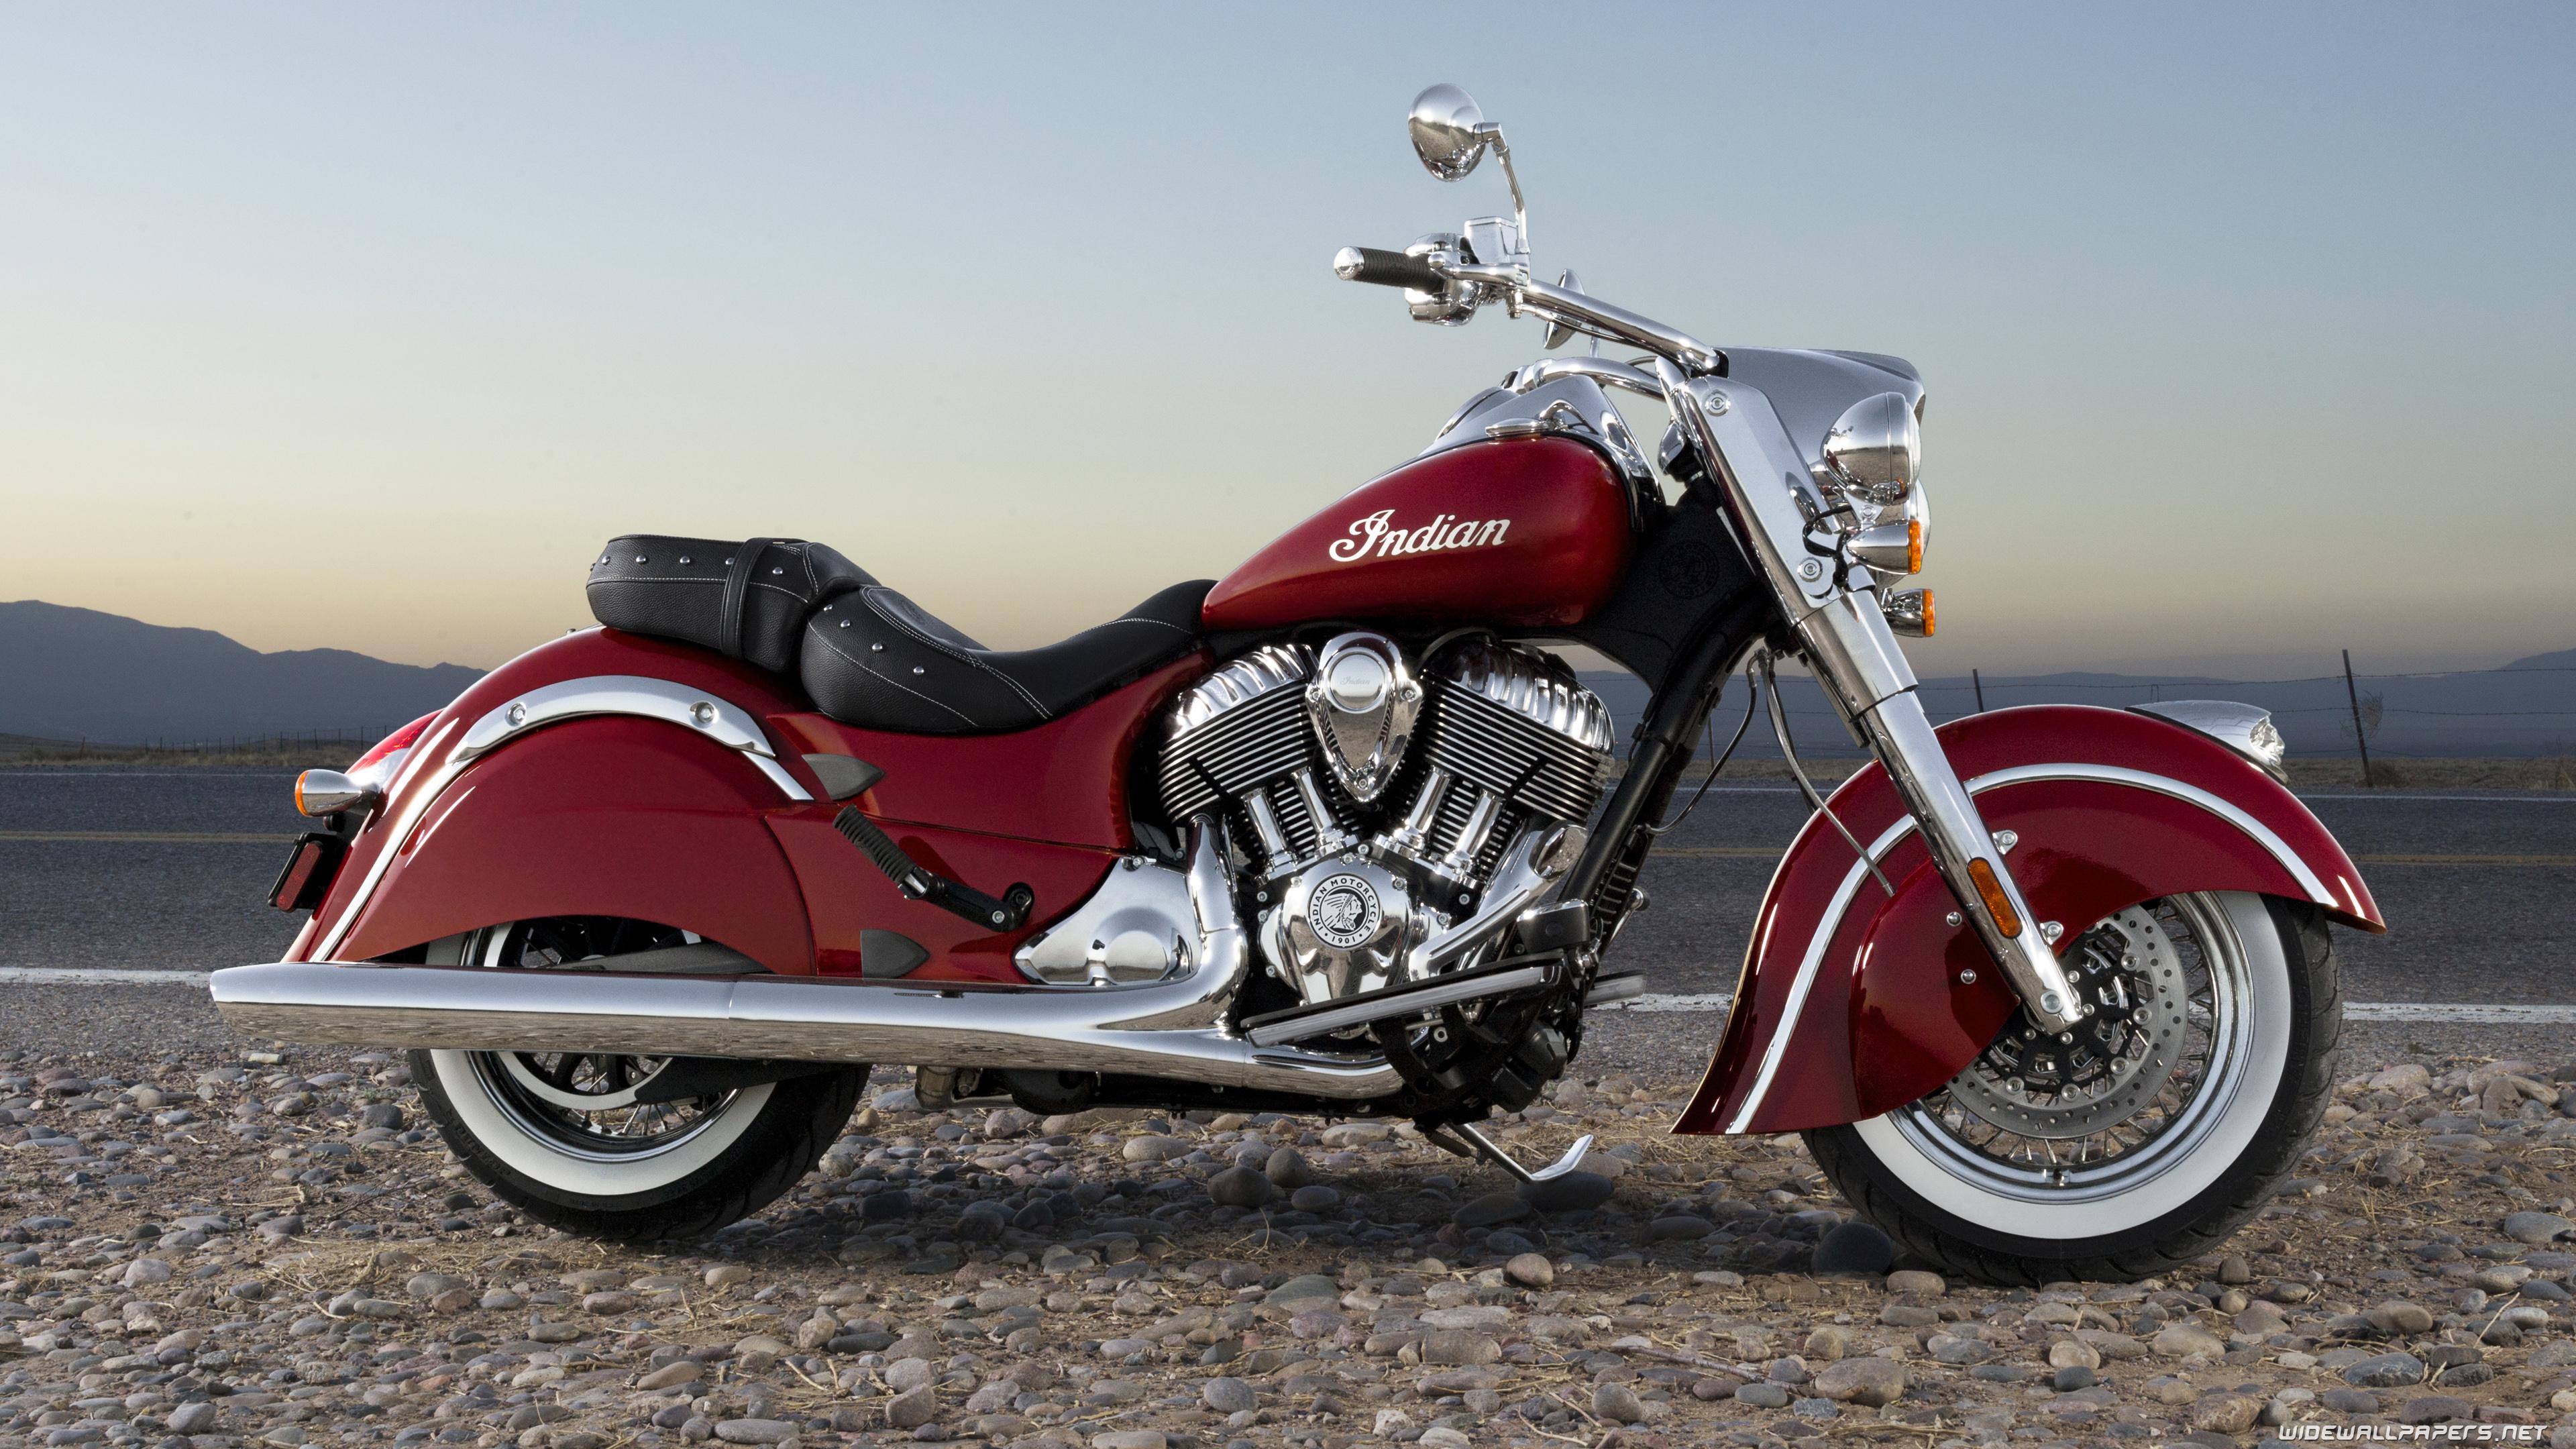 Indian Motorcycle Wallpaper 4k 3840x2160 Wallpaper Teahub Io